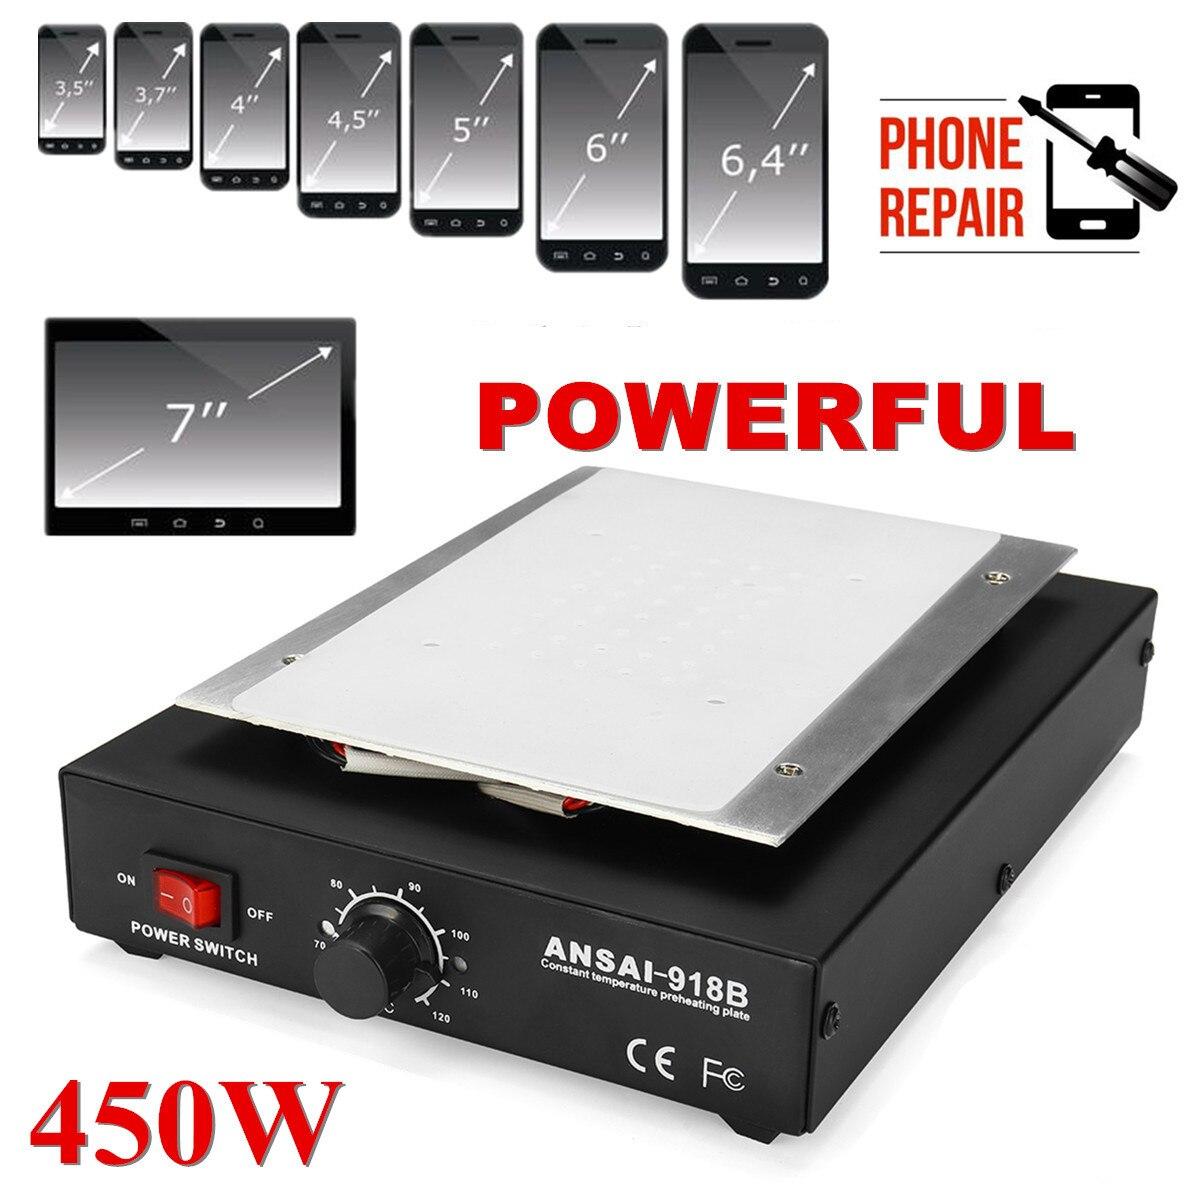 Doersupp 110V US 220V EU LCD Screen Separator Heating Platform Plate Glass Removal Phone Repair Machine Auto Heat Smooth Plate|Power Tool Sets|   - title=